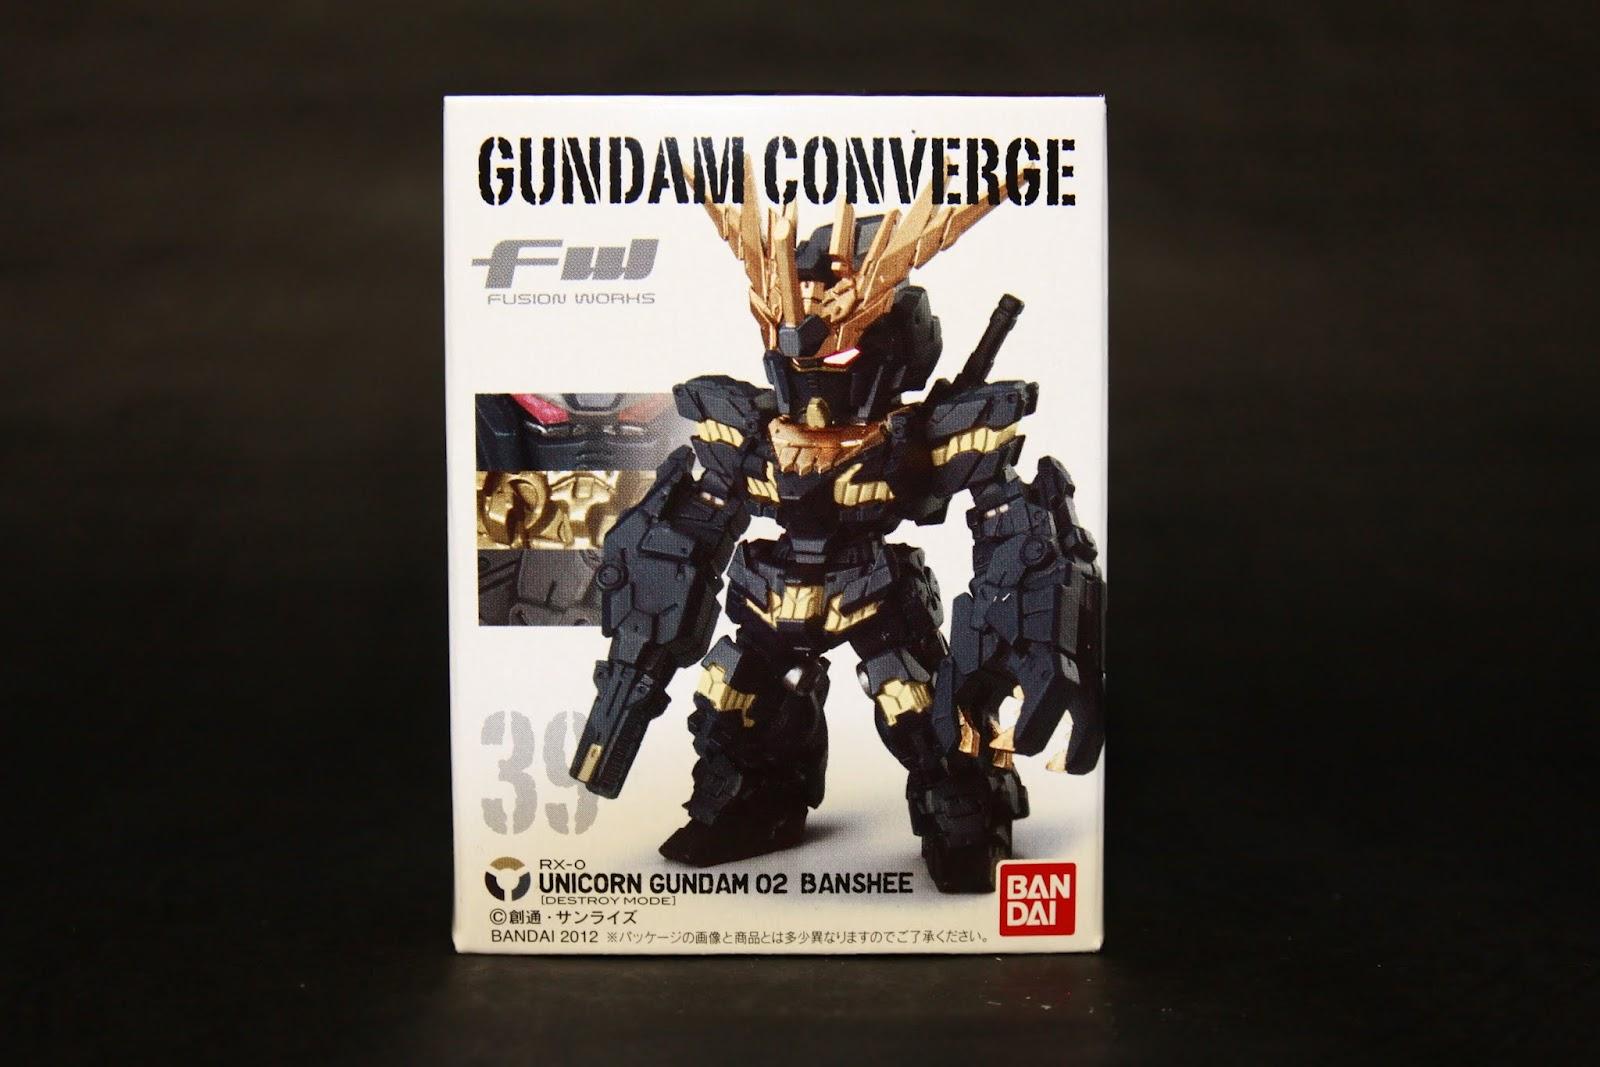 No 39 Unicron Gundam 02 Banshee